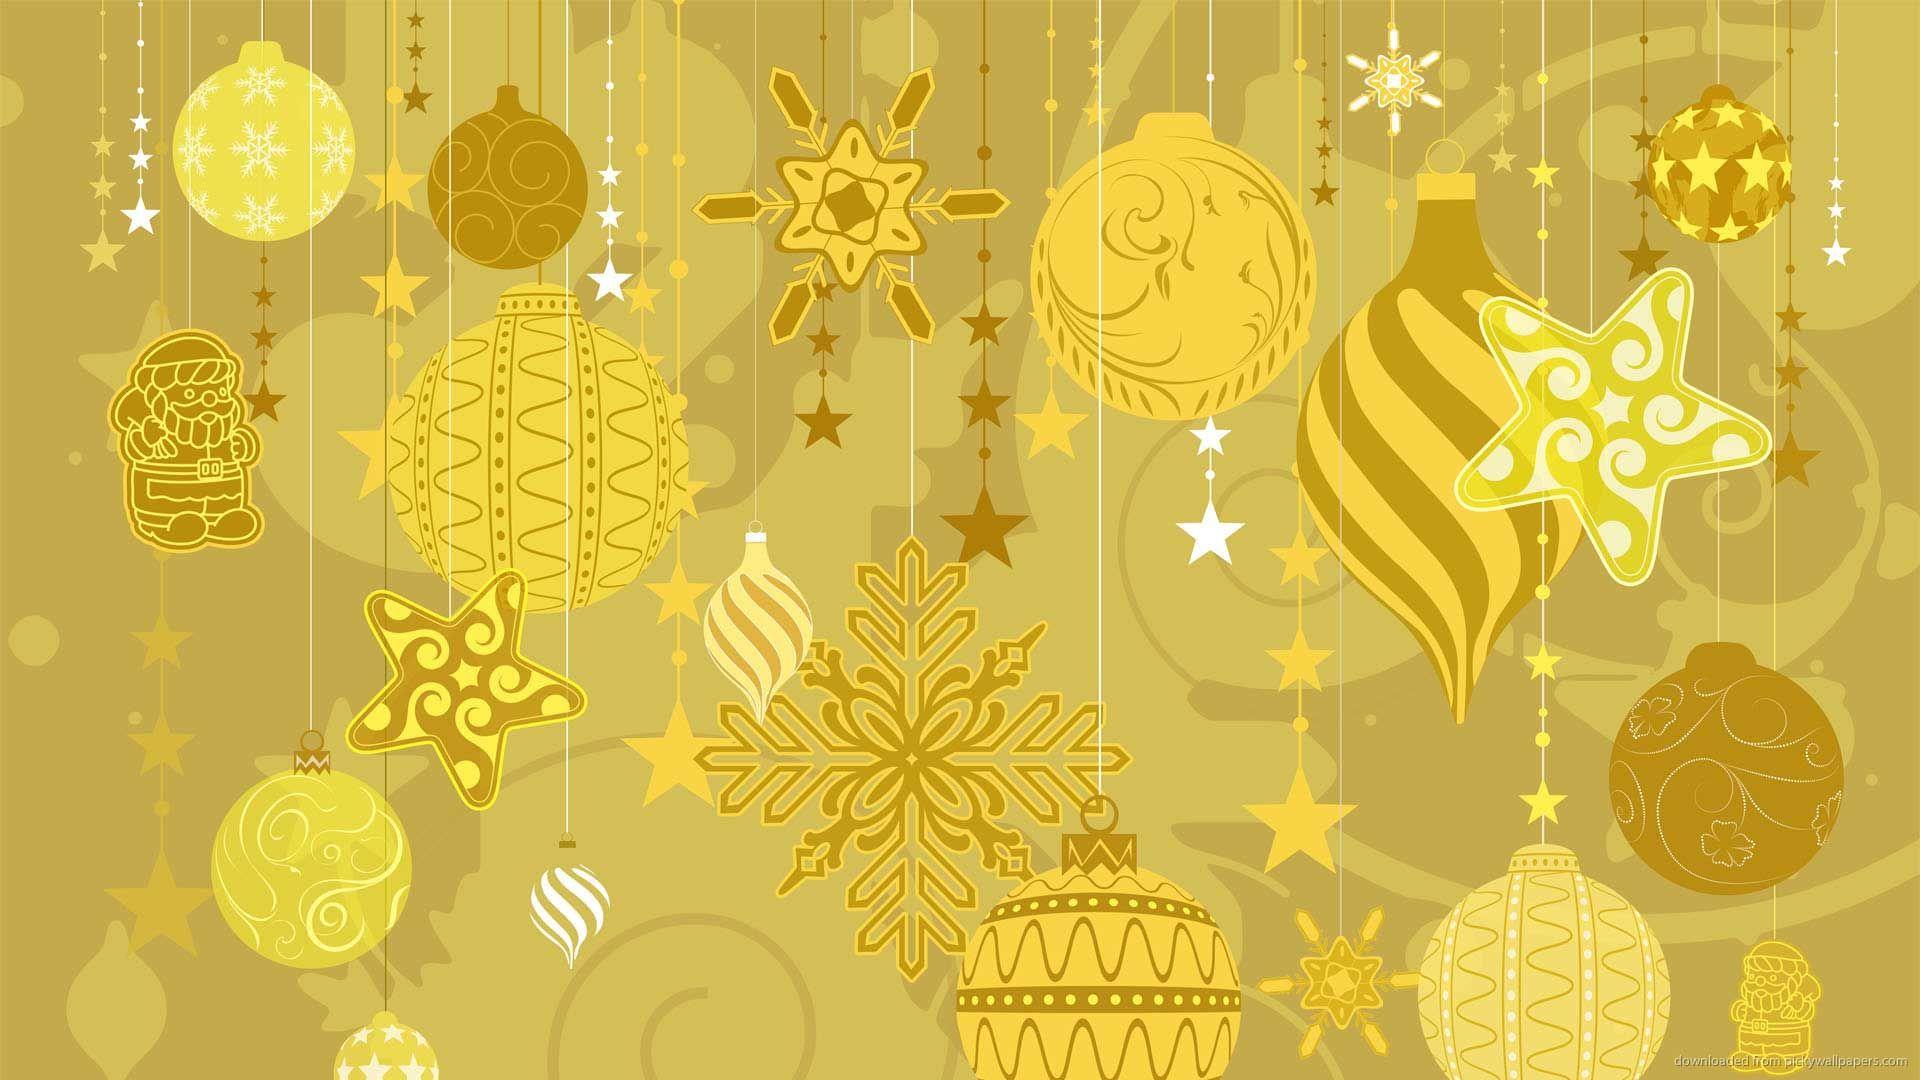 Christmas Scrapbooking Cool HD Wallpaper